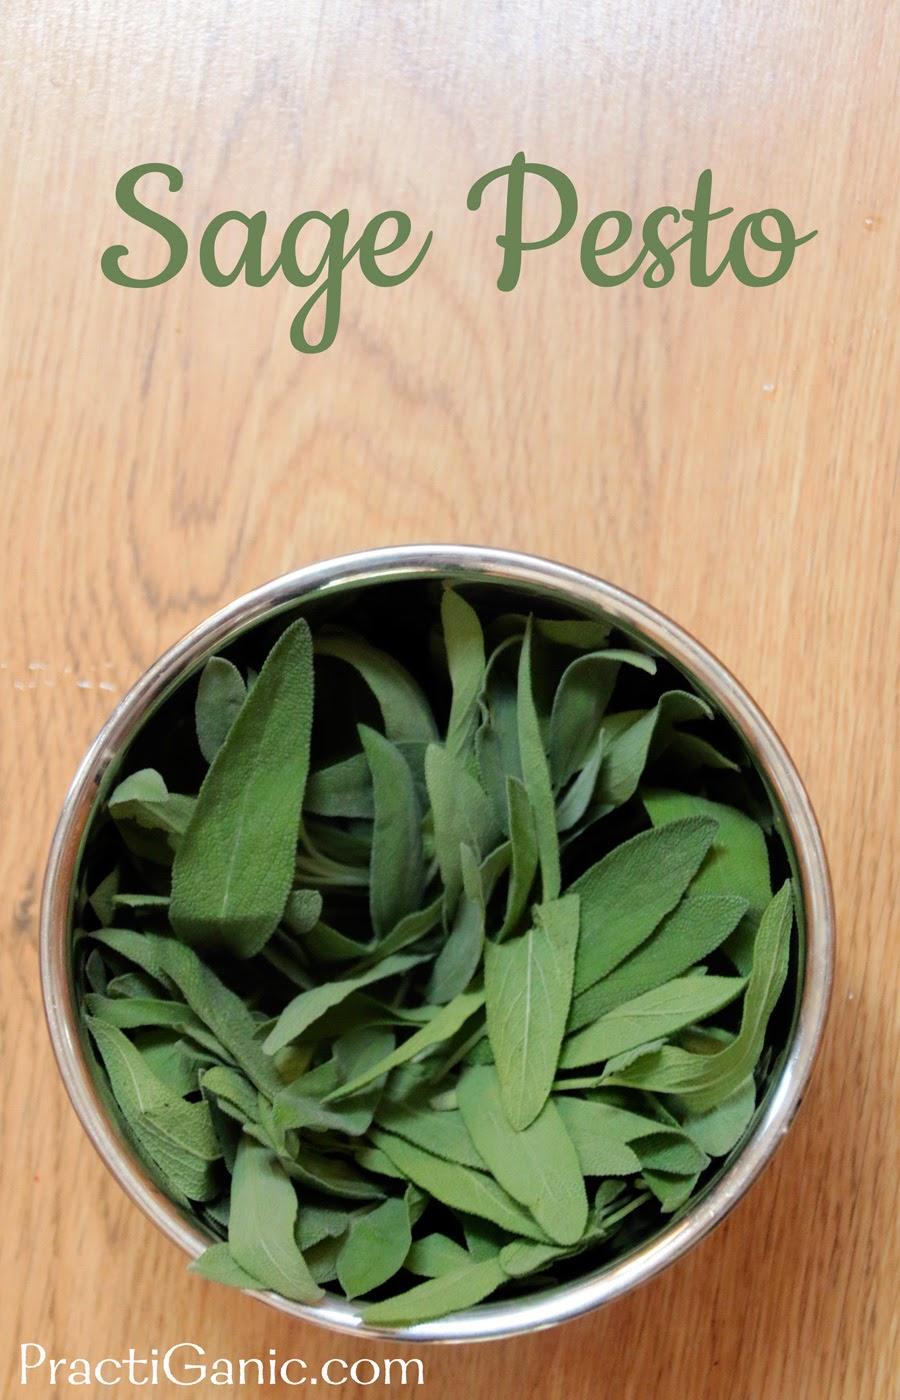 Sage Pesto